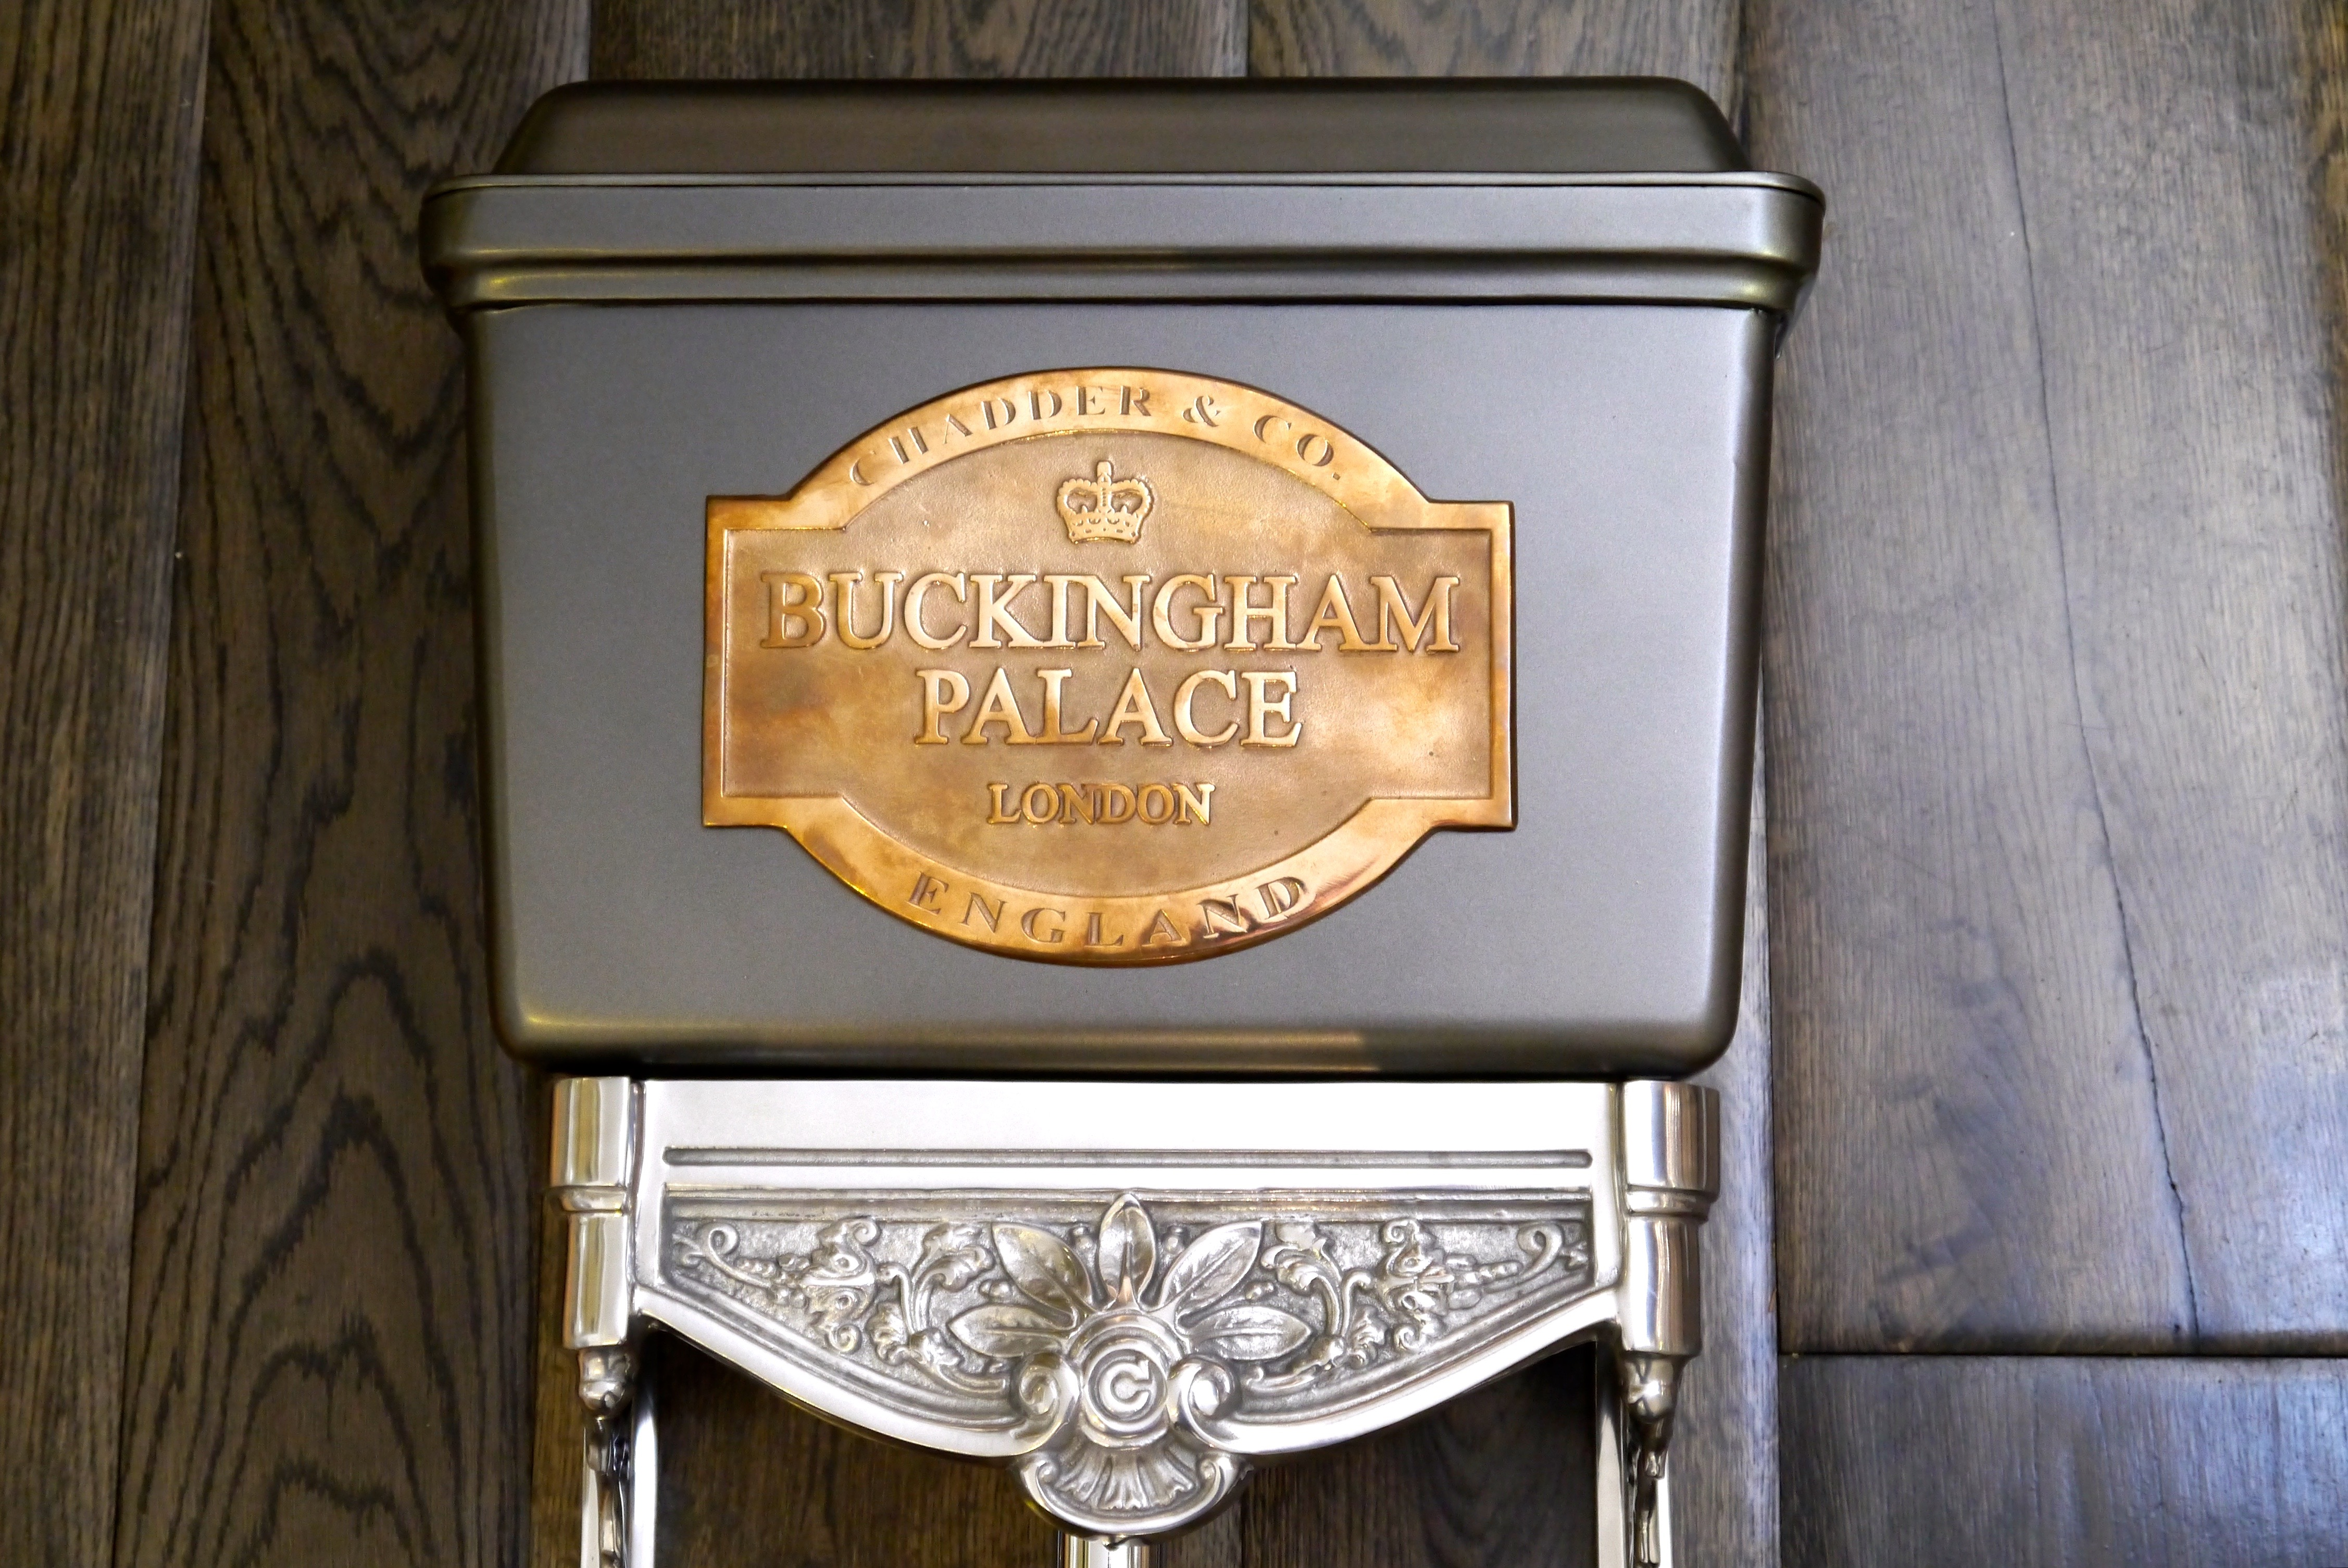 buckingham palace bespoke toilet cistern